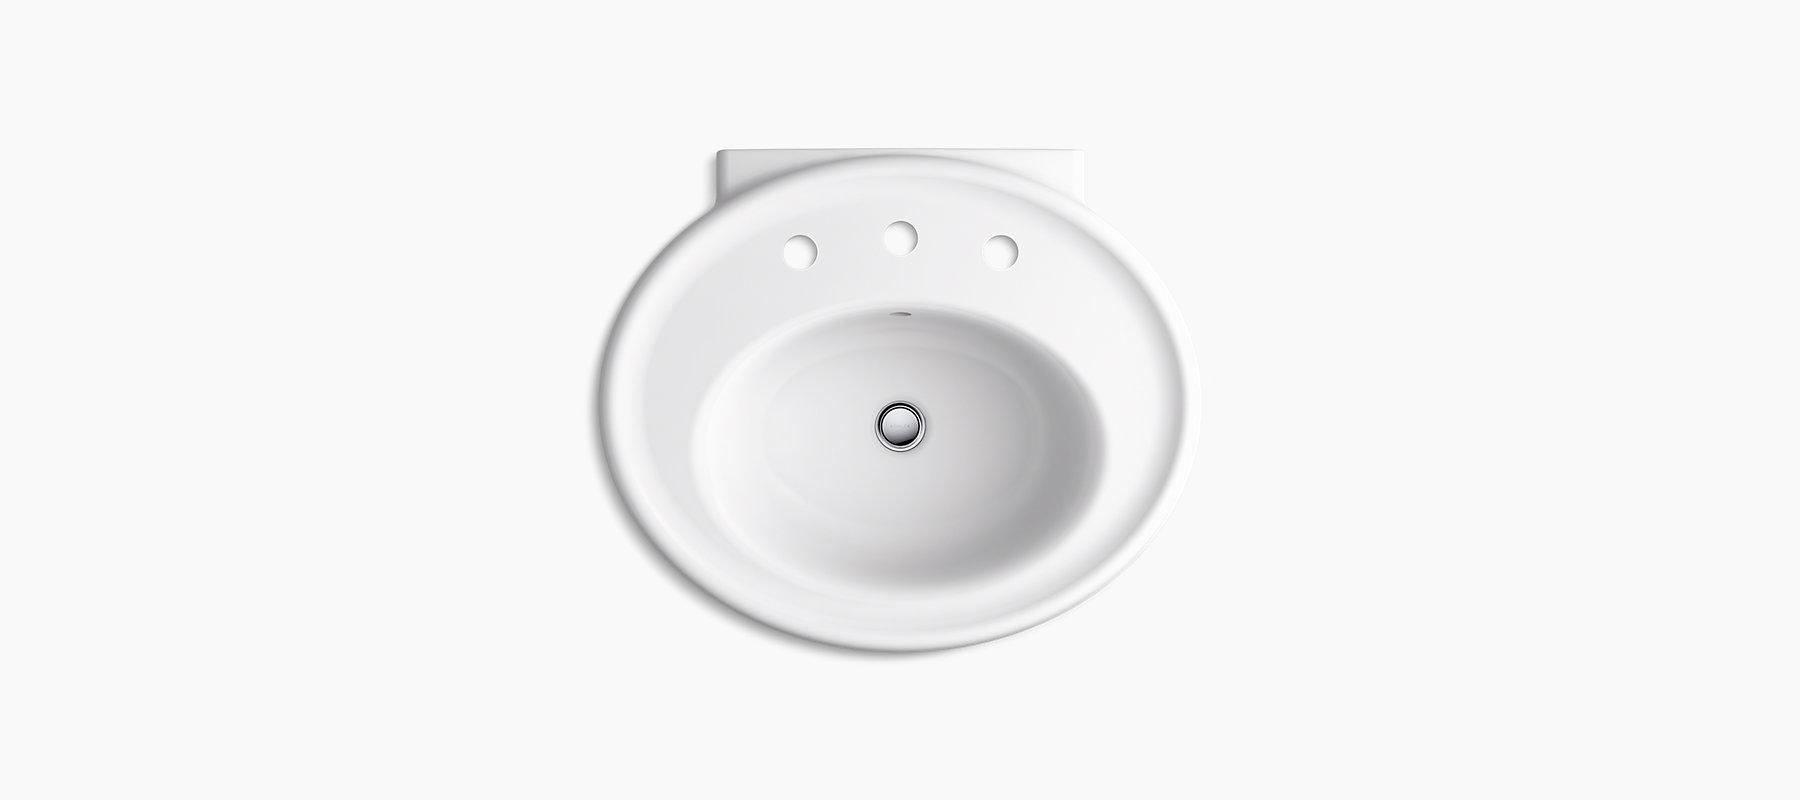 K R6384 8 Willamette Pedestal Sink Basin Kohler